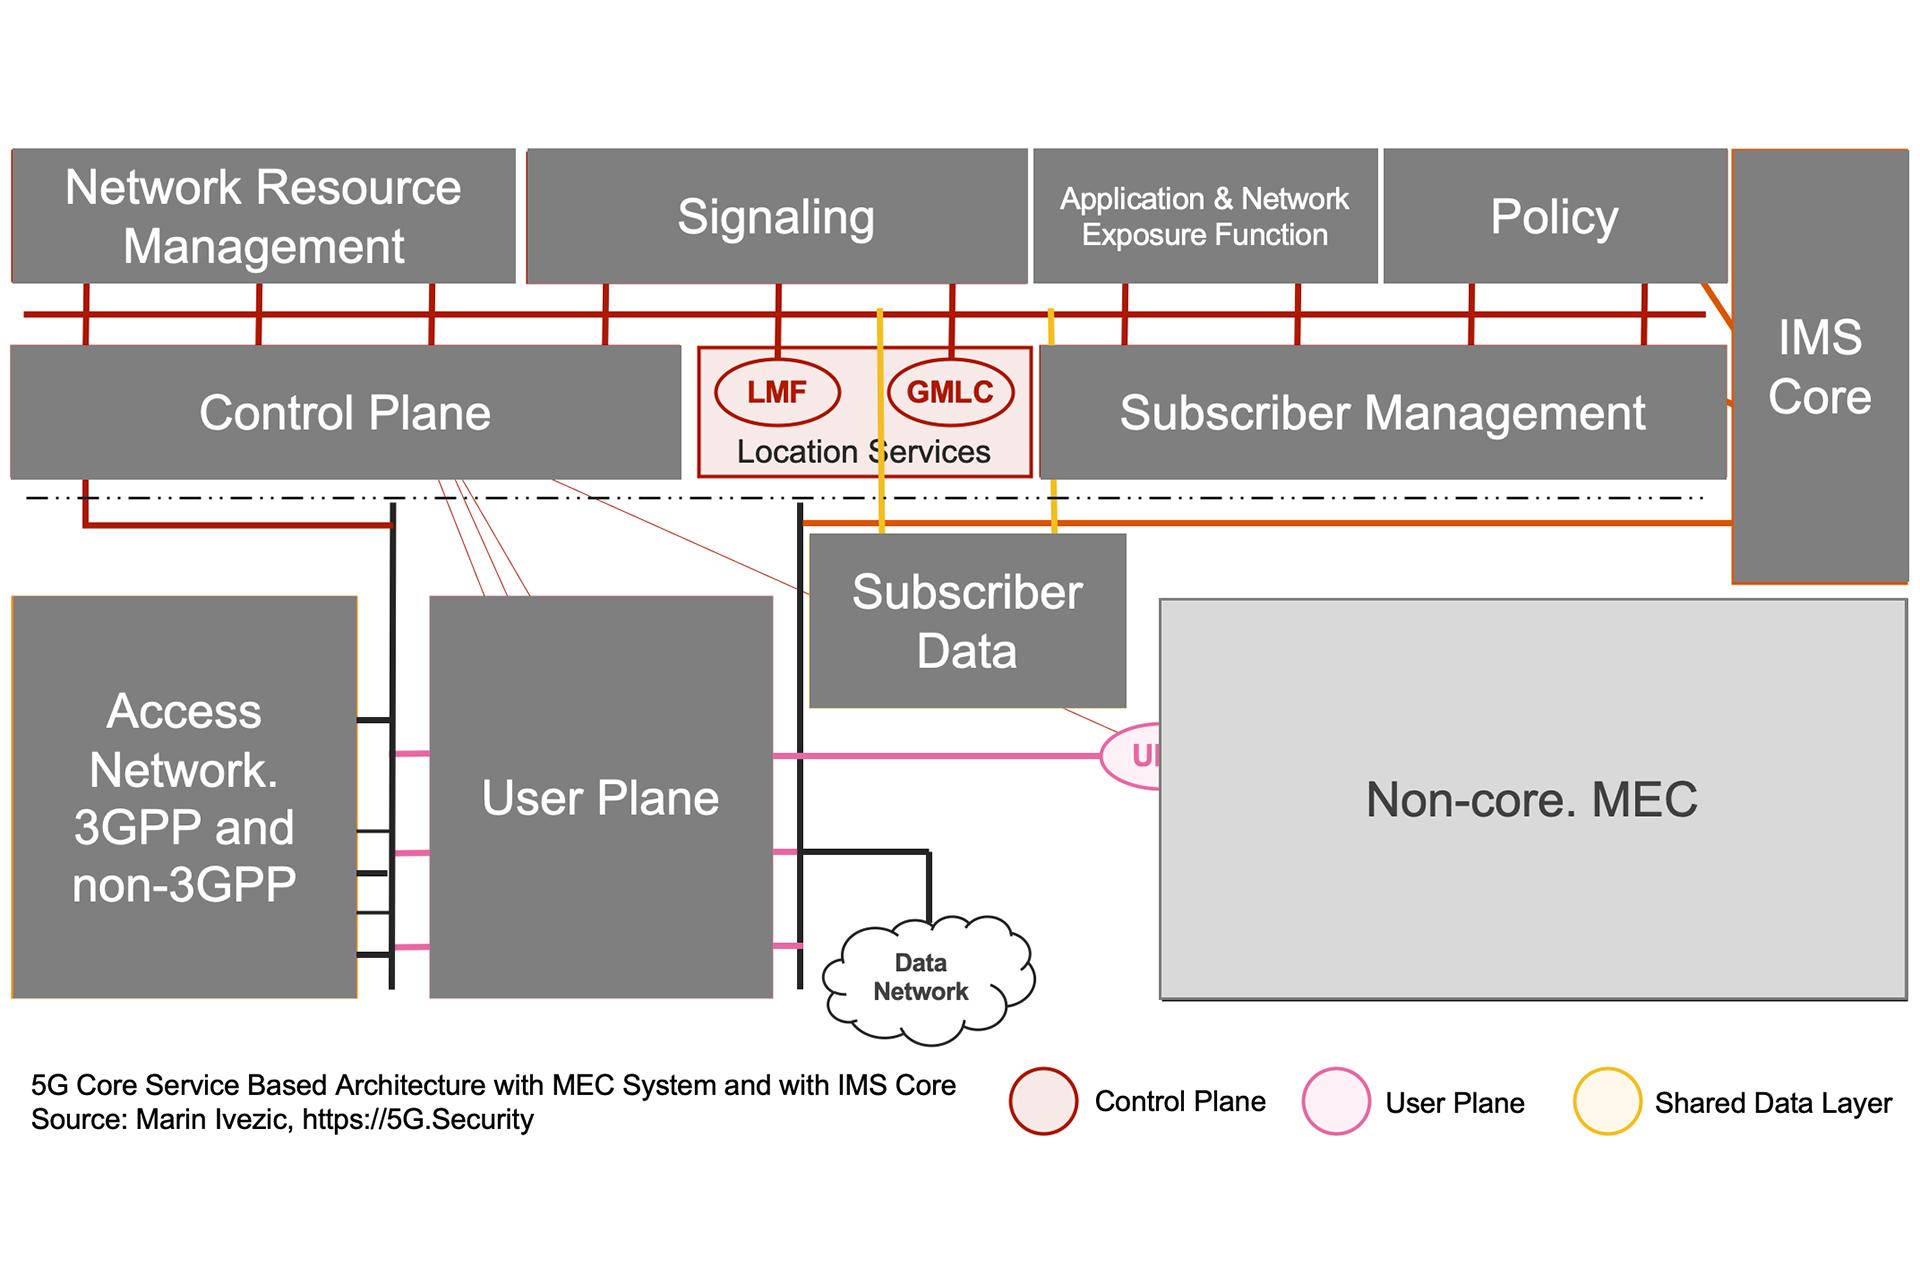 5G SBA IMS MEC Architecture - Location Services